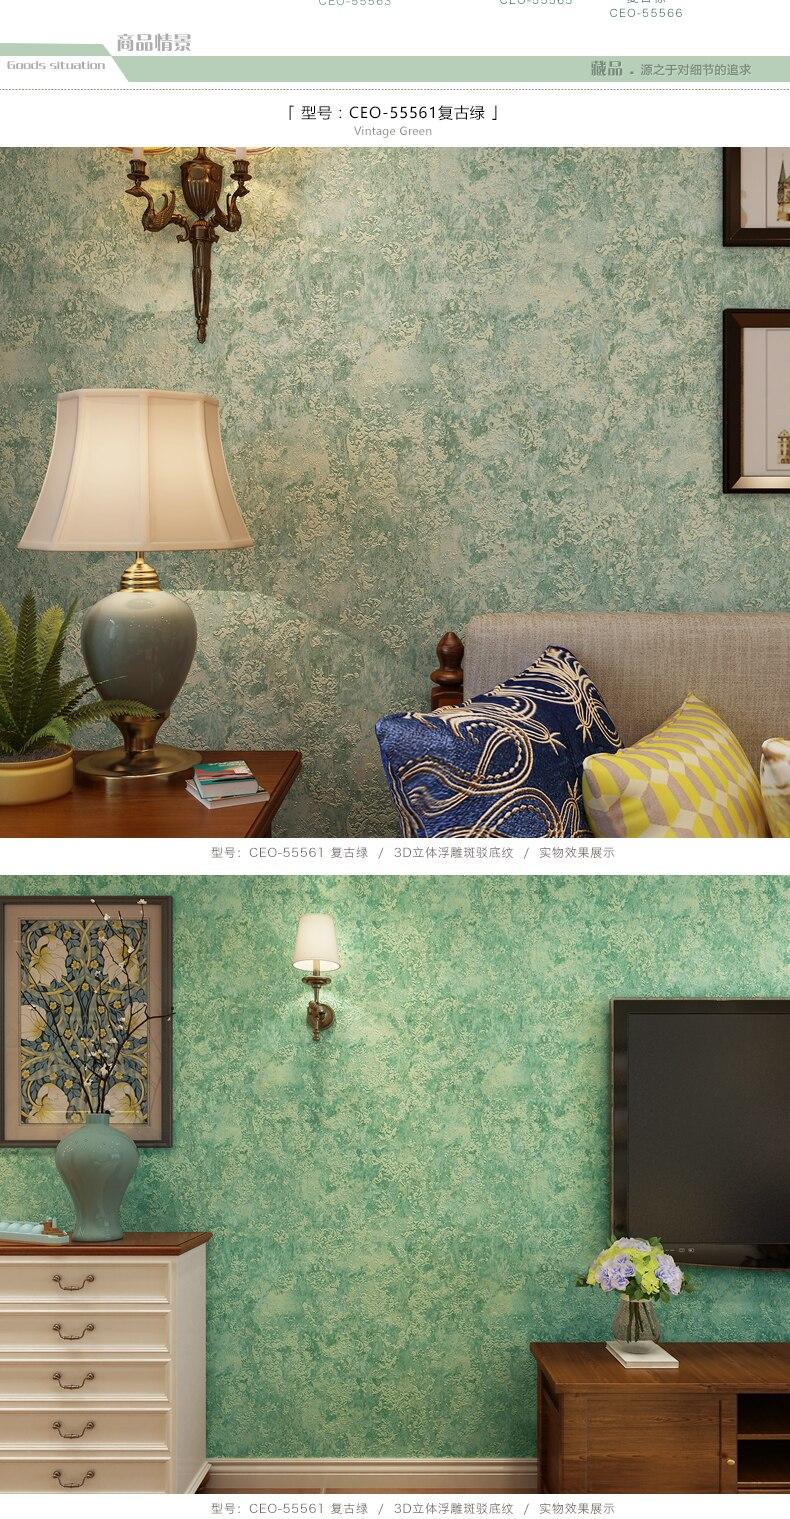 Solid Color Embossed Wallpaper Bedroom Living Room Sofa Tv Background Green Pink Yellow Beige Brown Wall Paper Roll Pc Wallpaper In Hd Pc Wallpapers